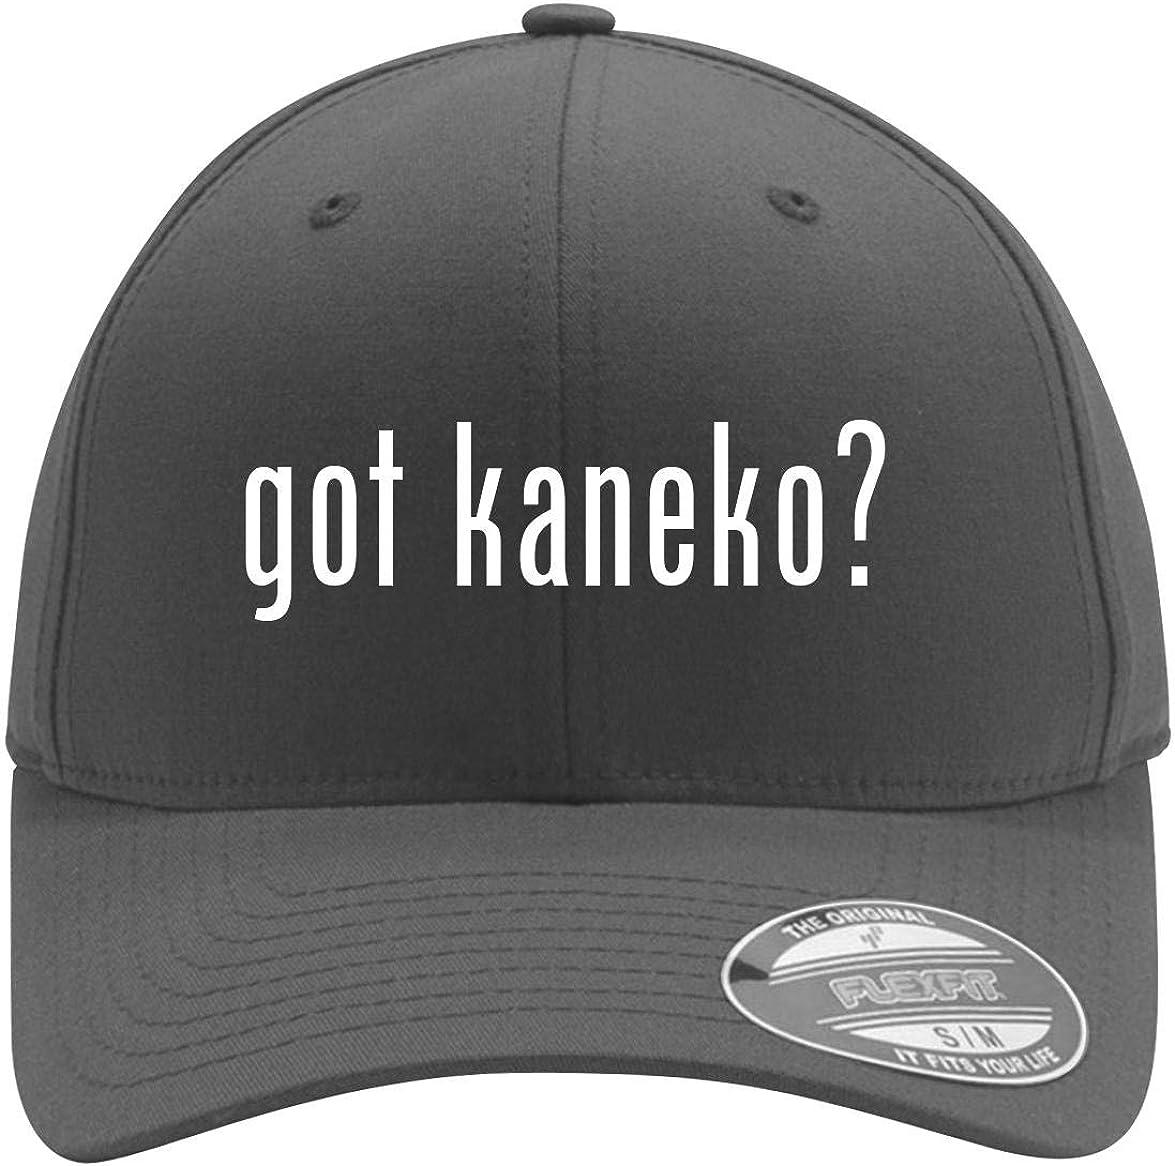 got Kaneko - Adult Men's Flexfit Baseball Hat Cap 61rXTH%2BUxSL